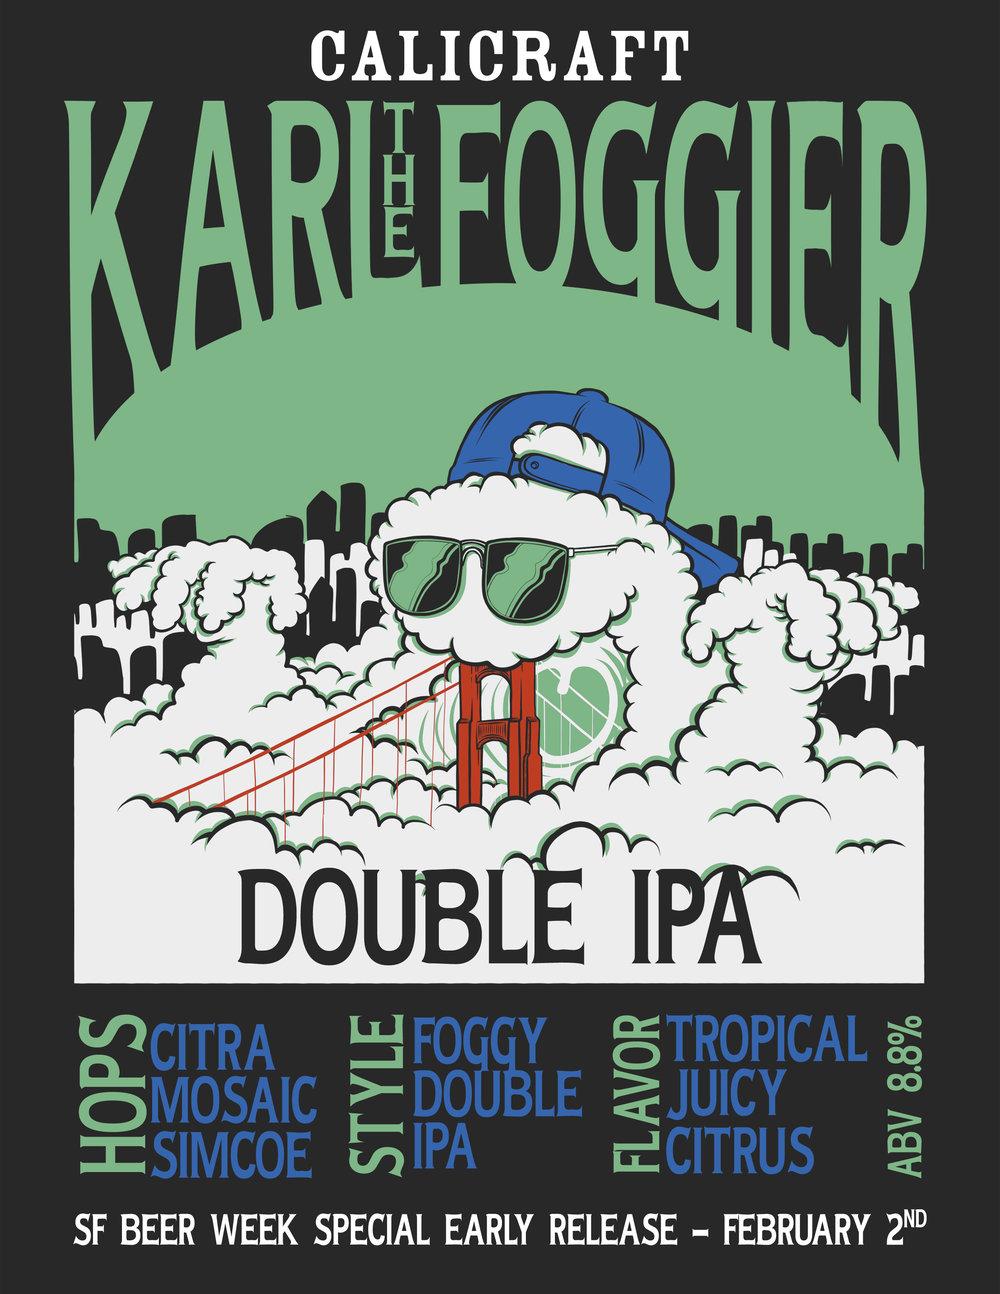 karl the foggier good .jpg